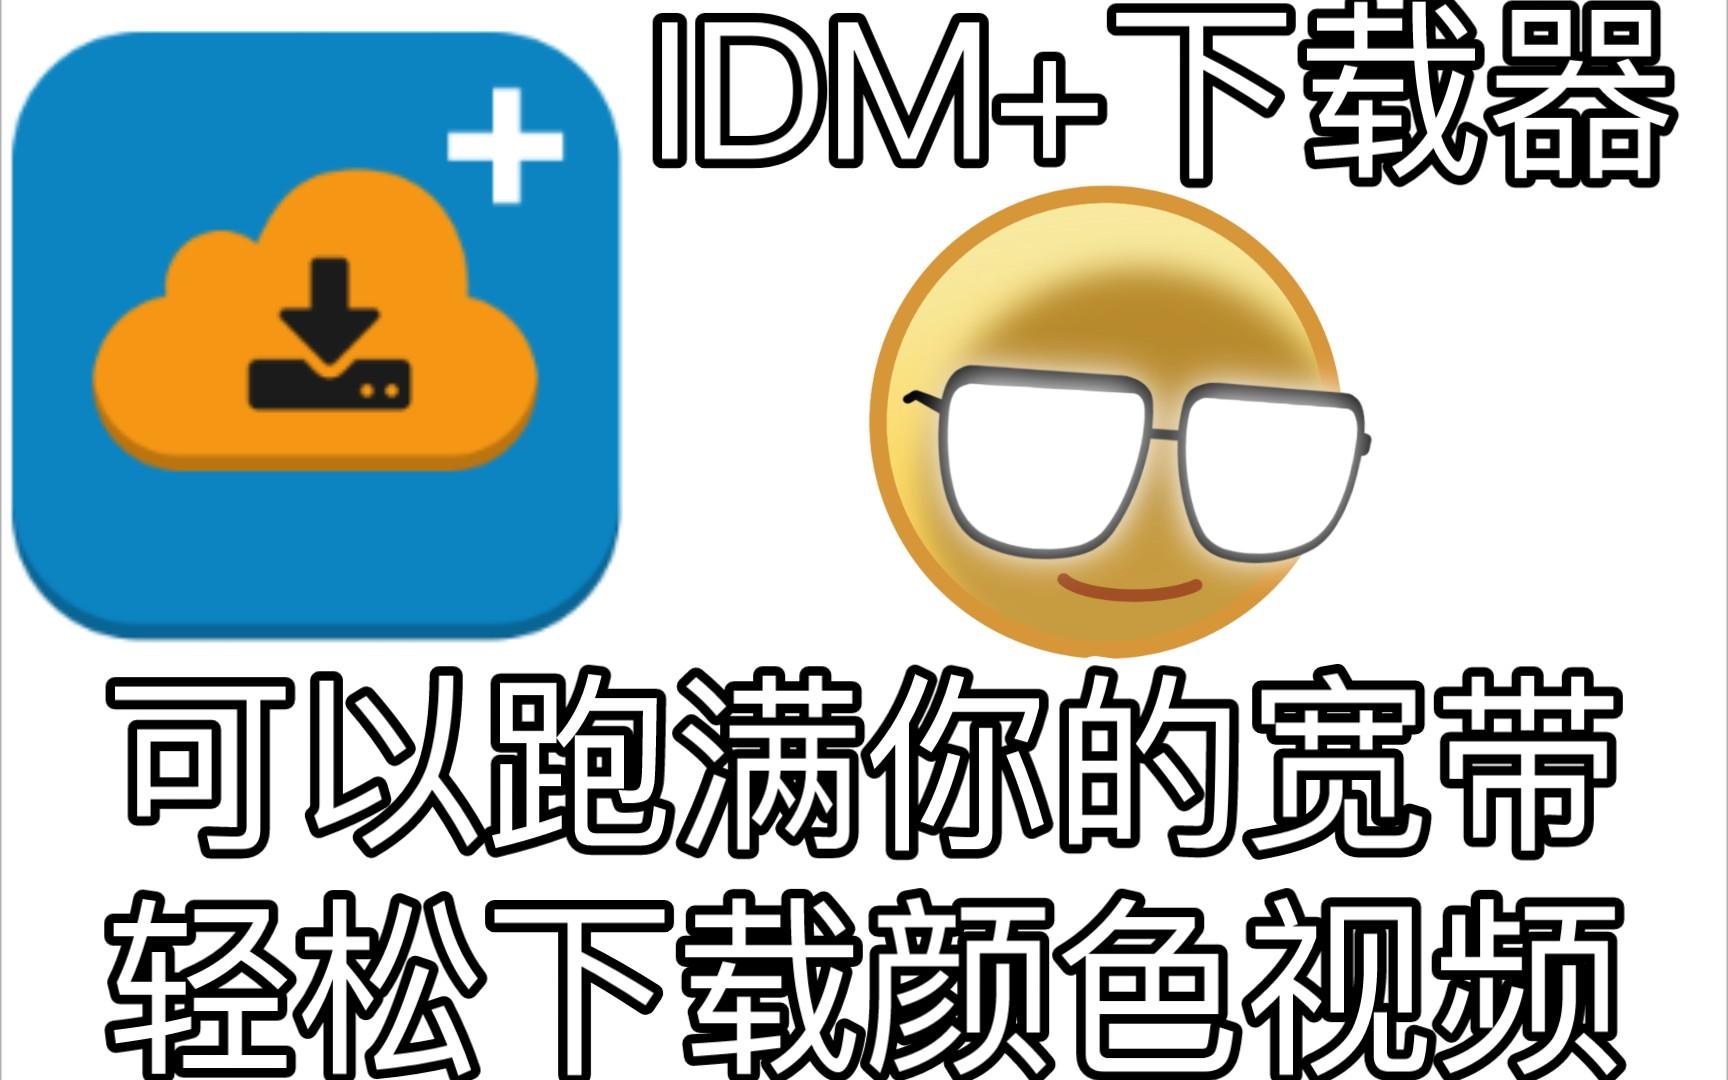 IDM+ 解锁版,附带视频教程